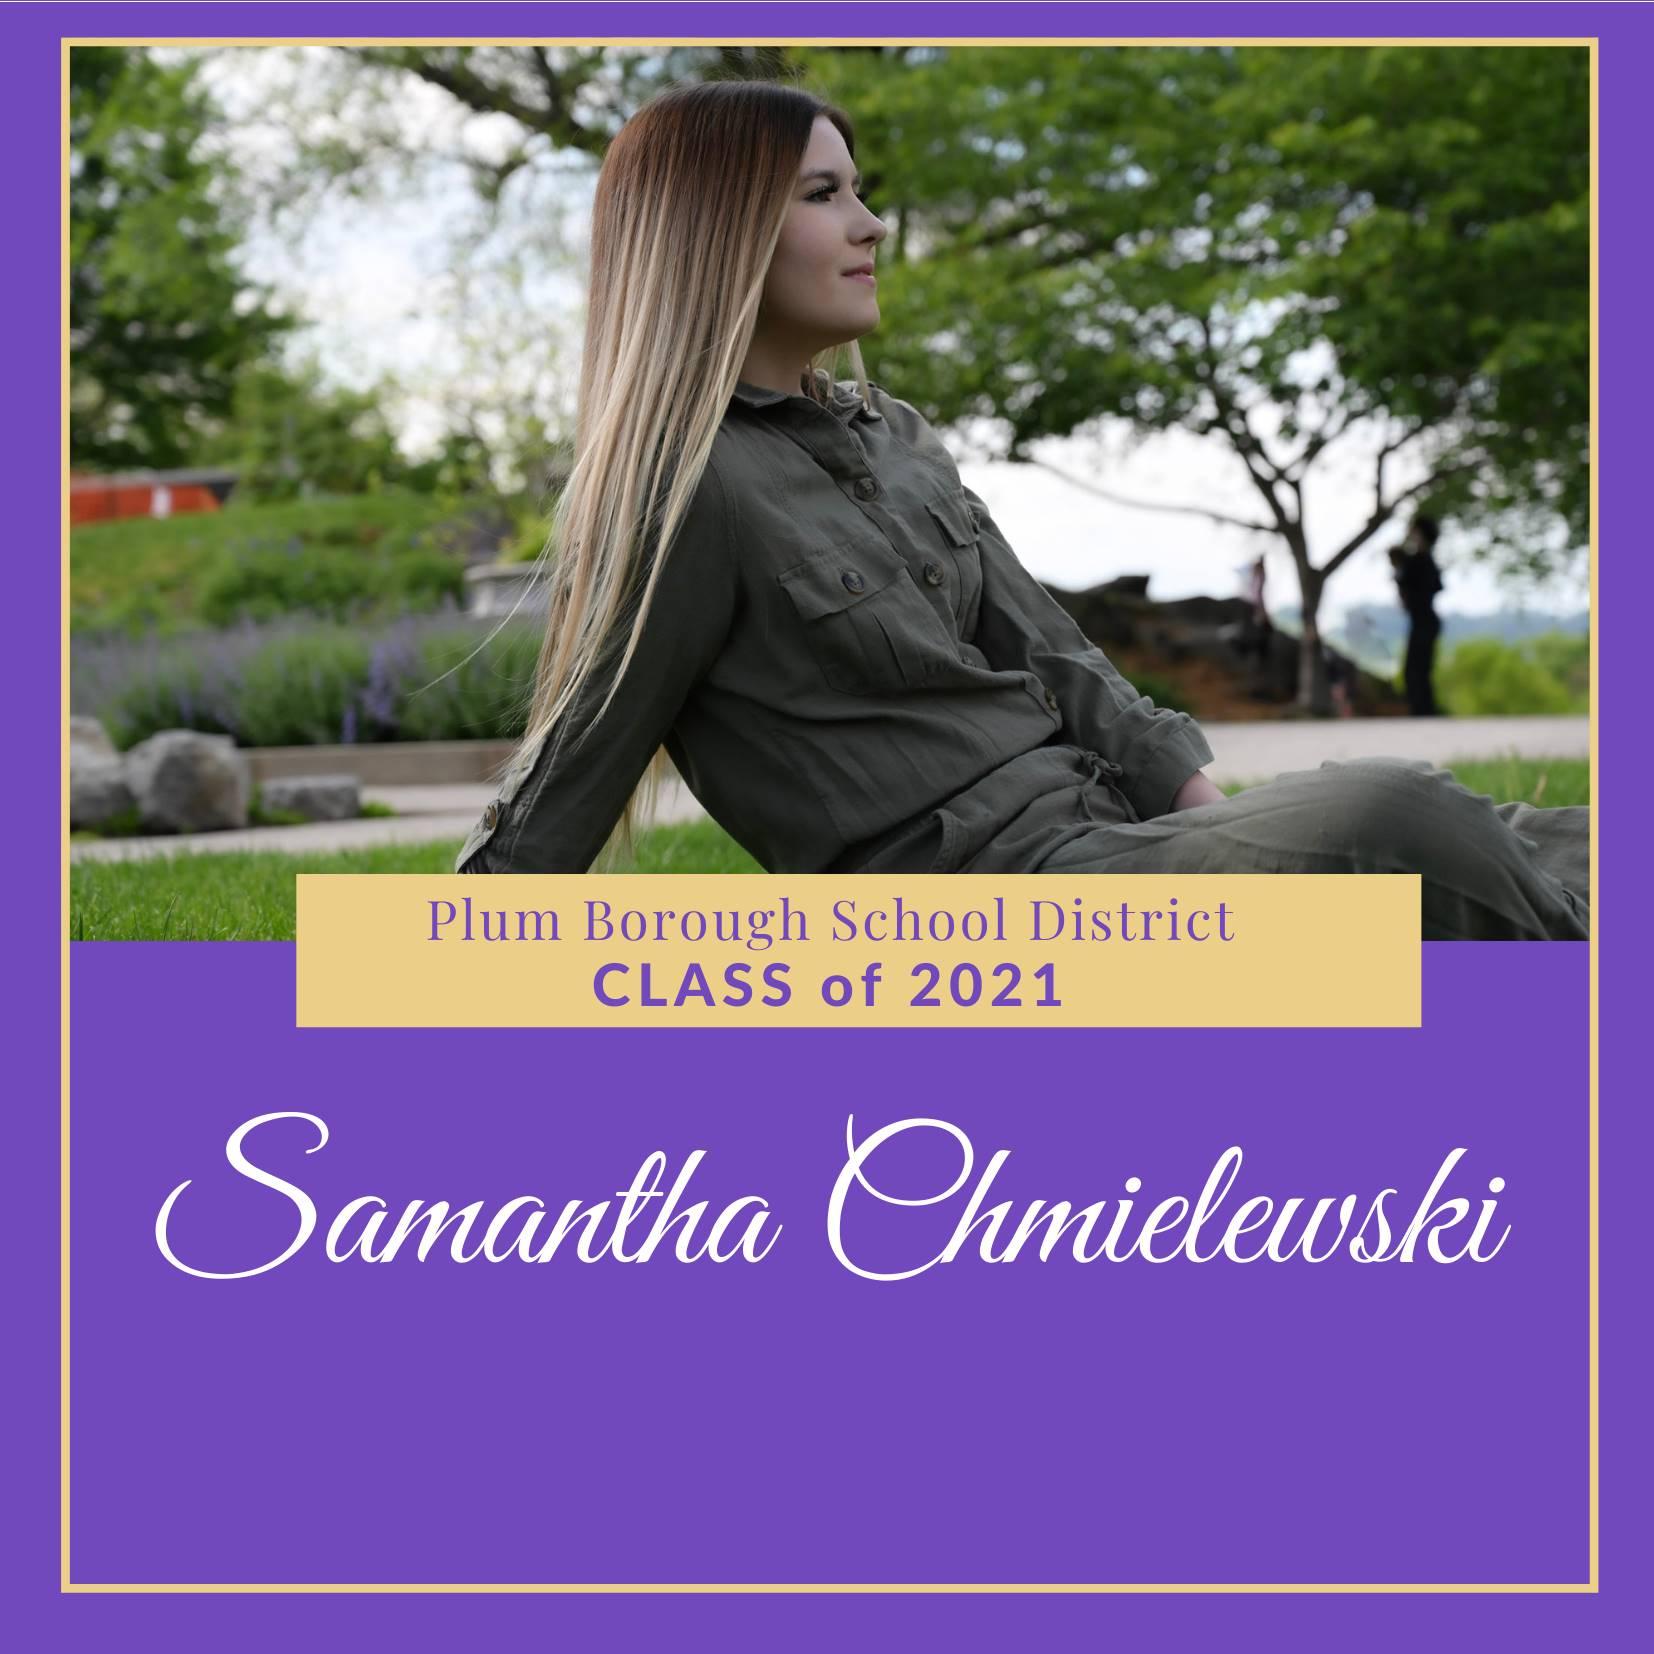 Congratulations to Samantha Chmielewski, Class of 2021!